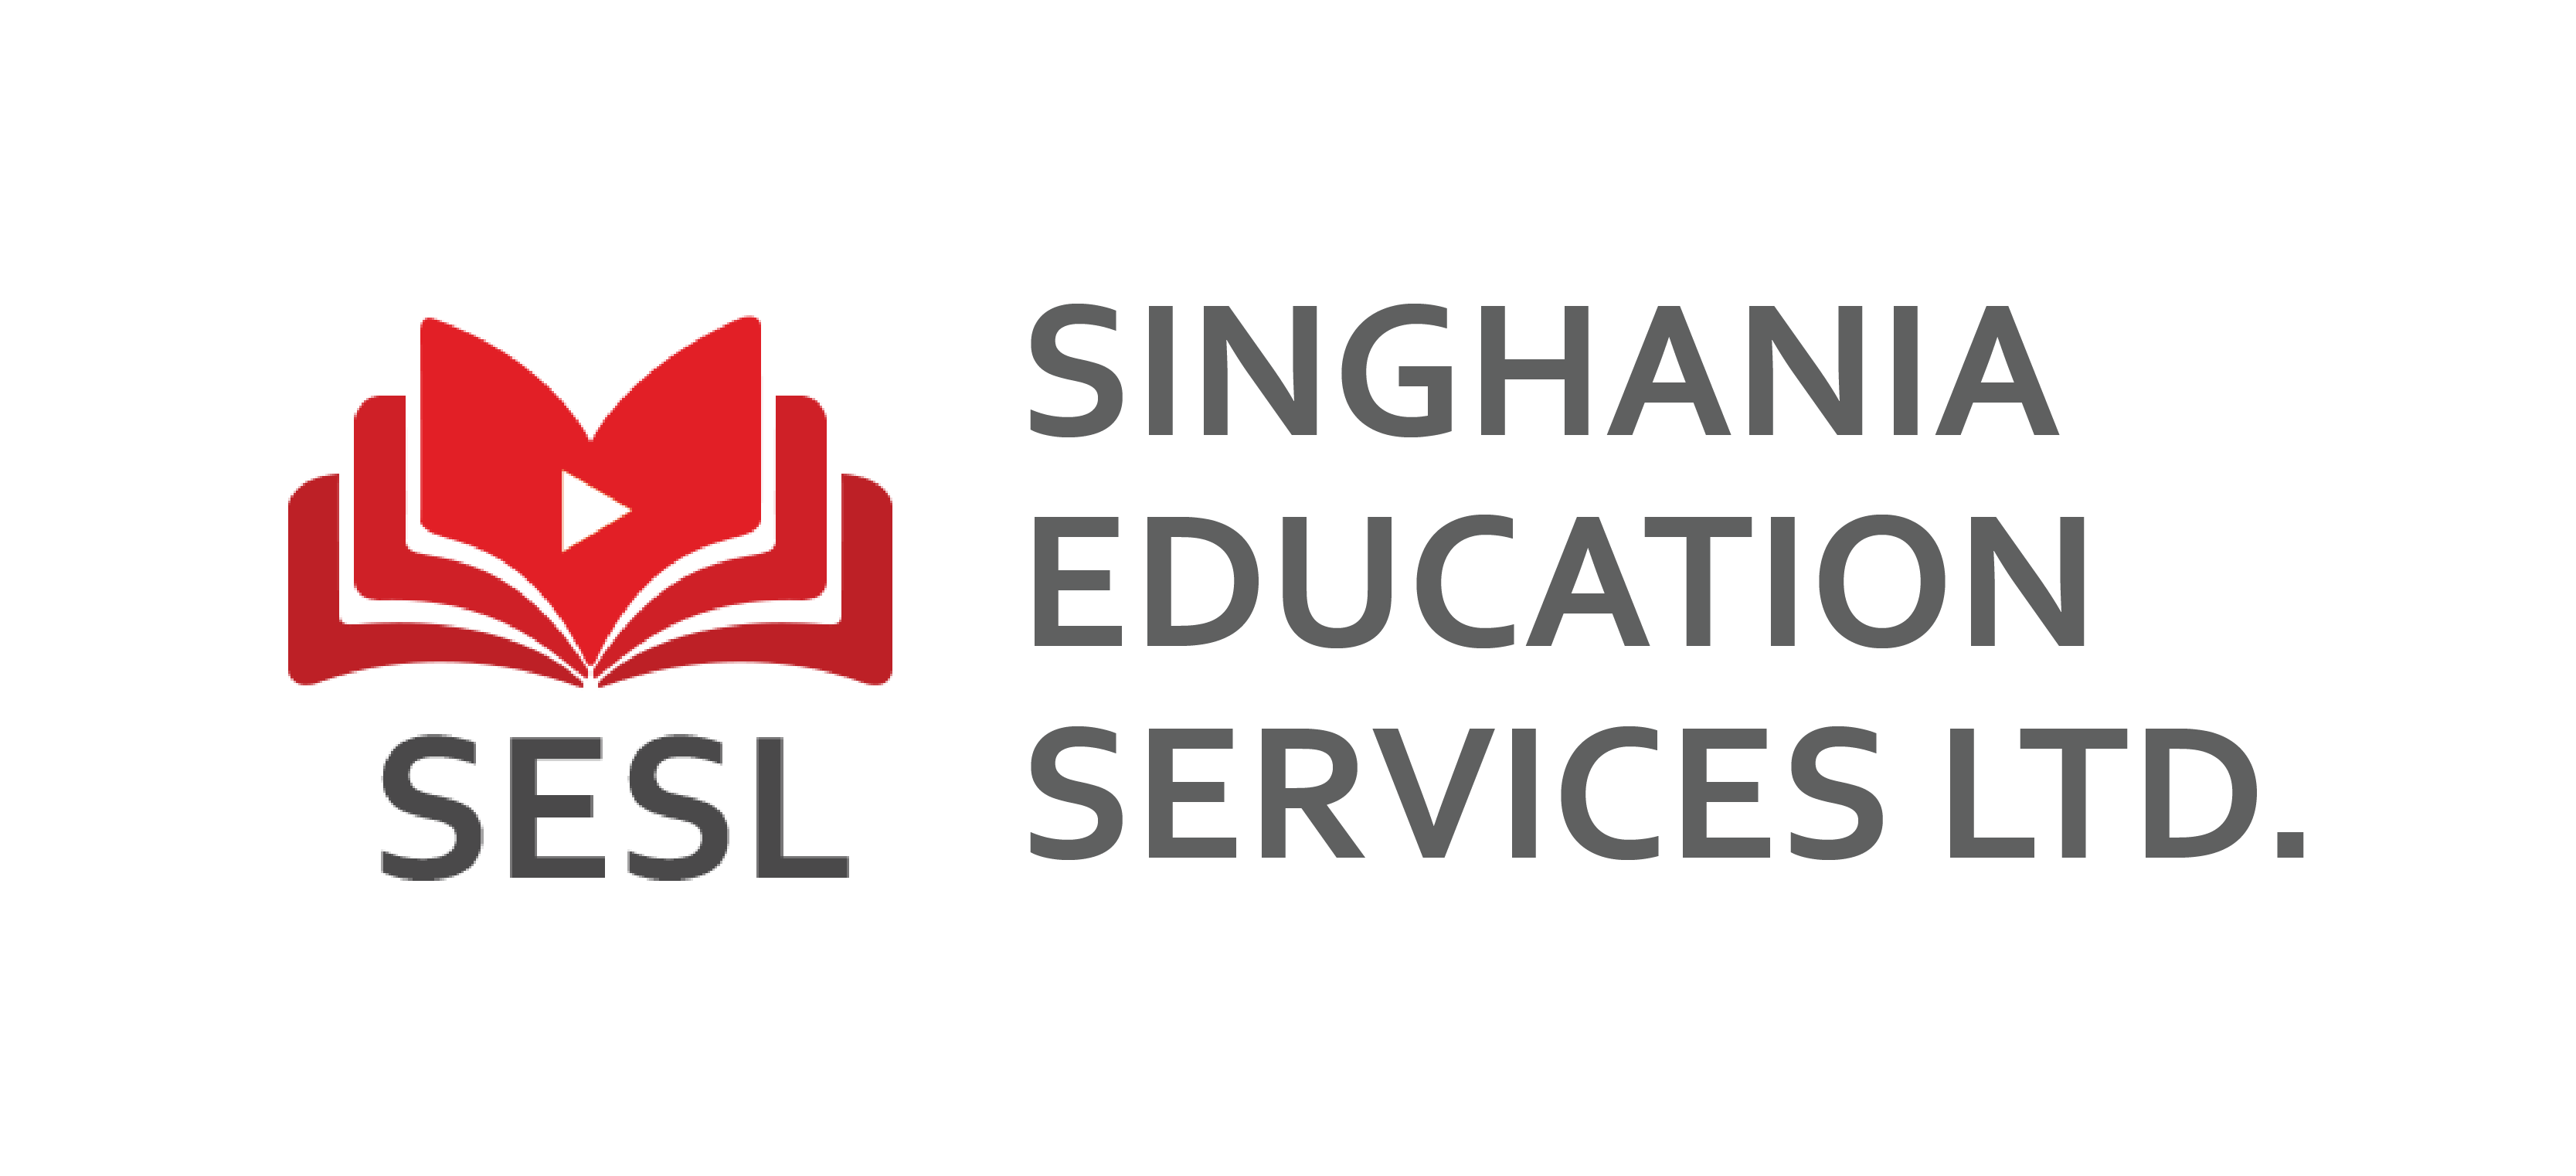 Singhania Education Services Ltd.